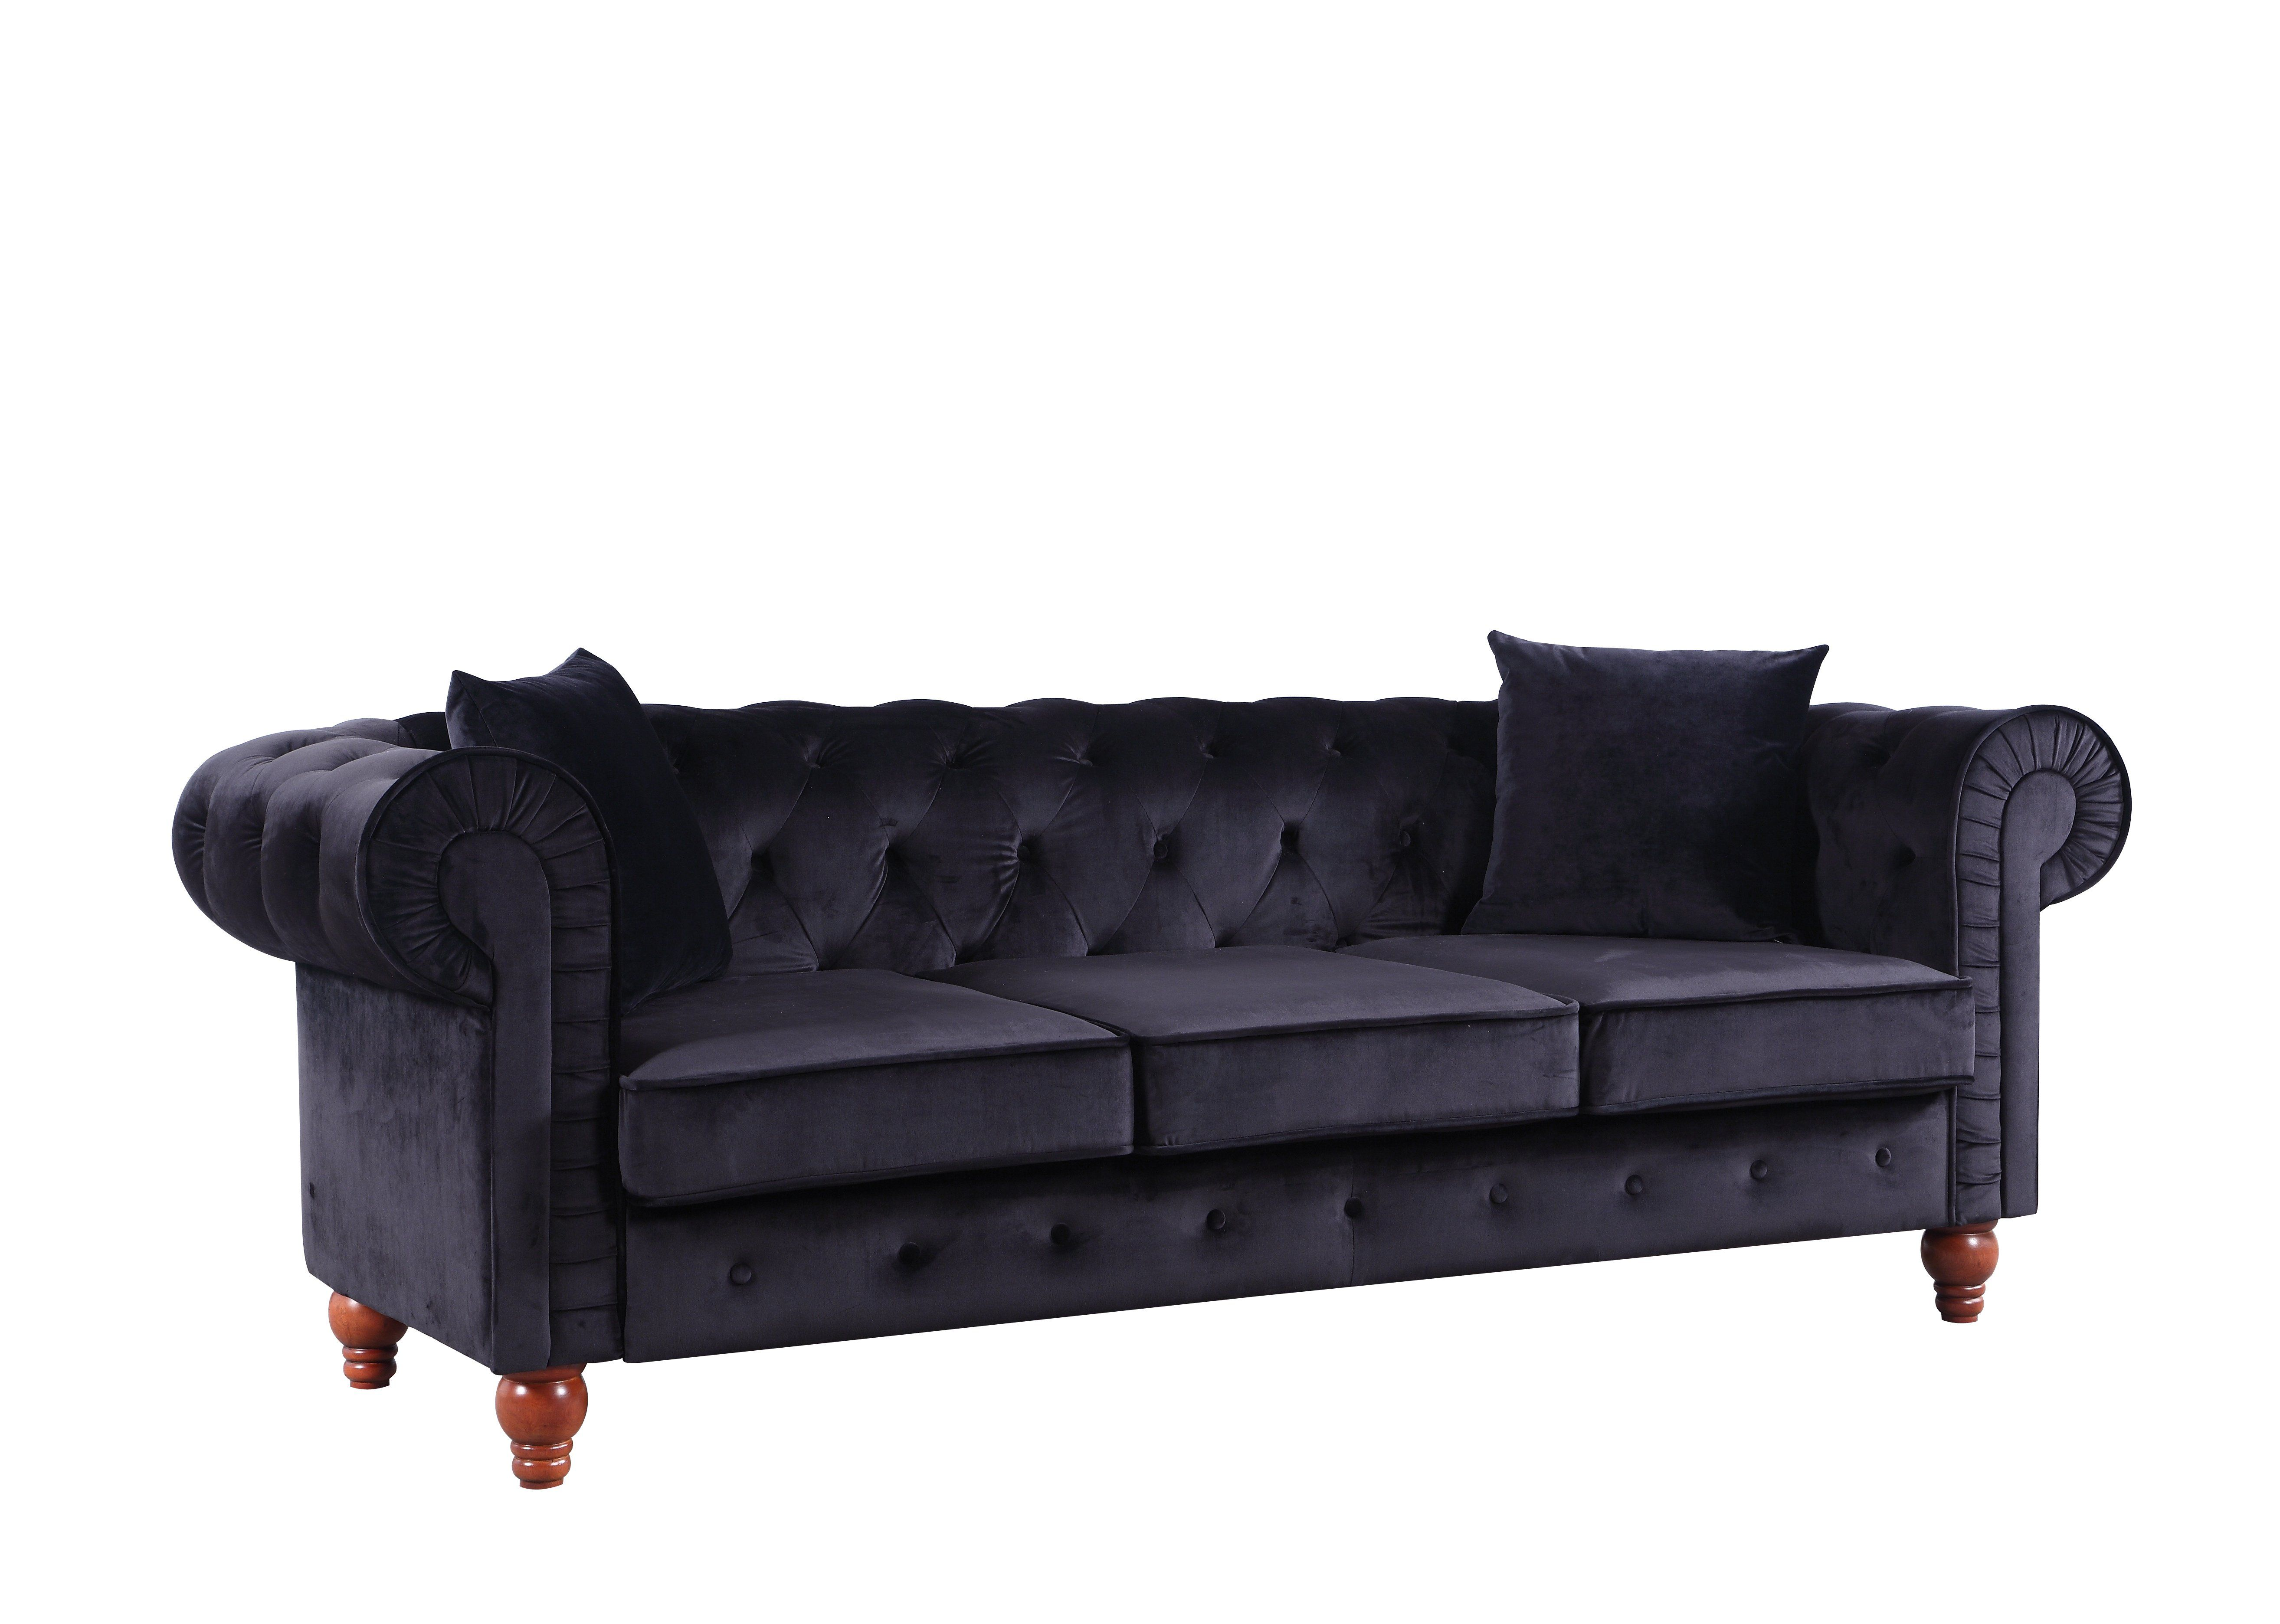 Stratford Clic Velvet Fabric Chesterfield Sofa Black